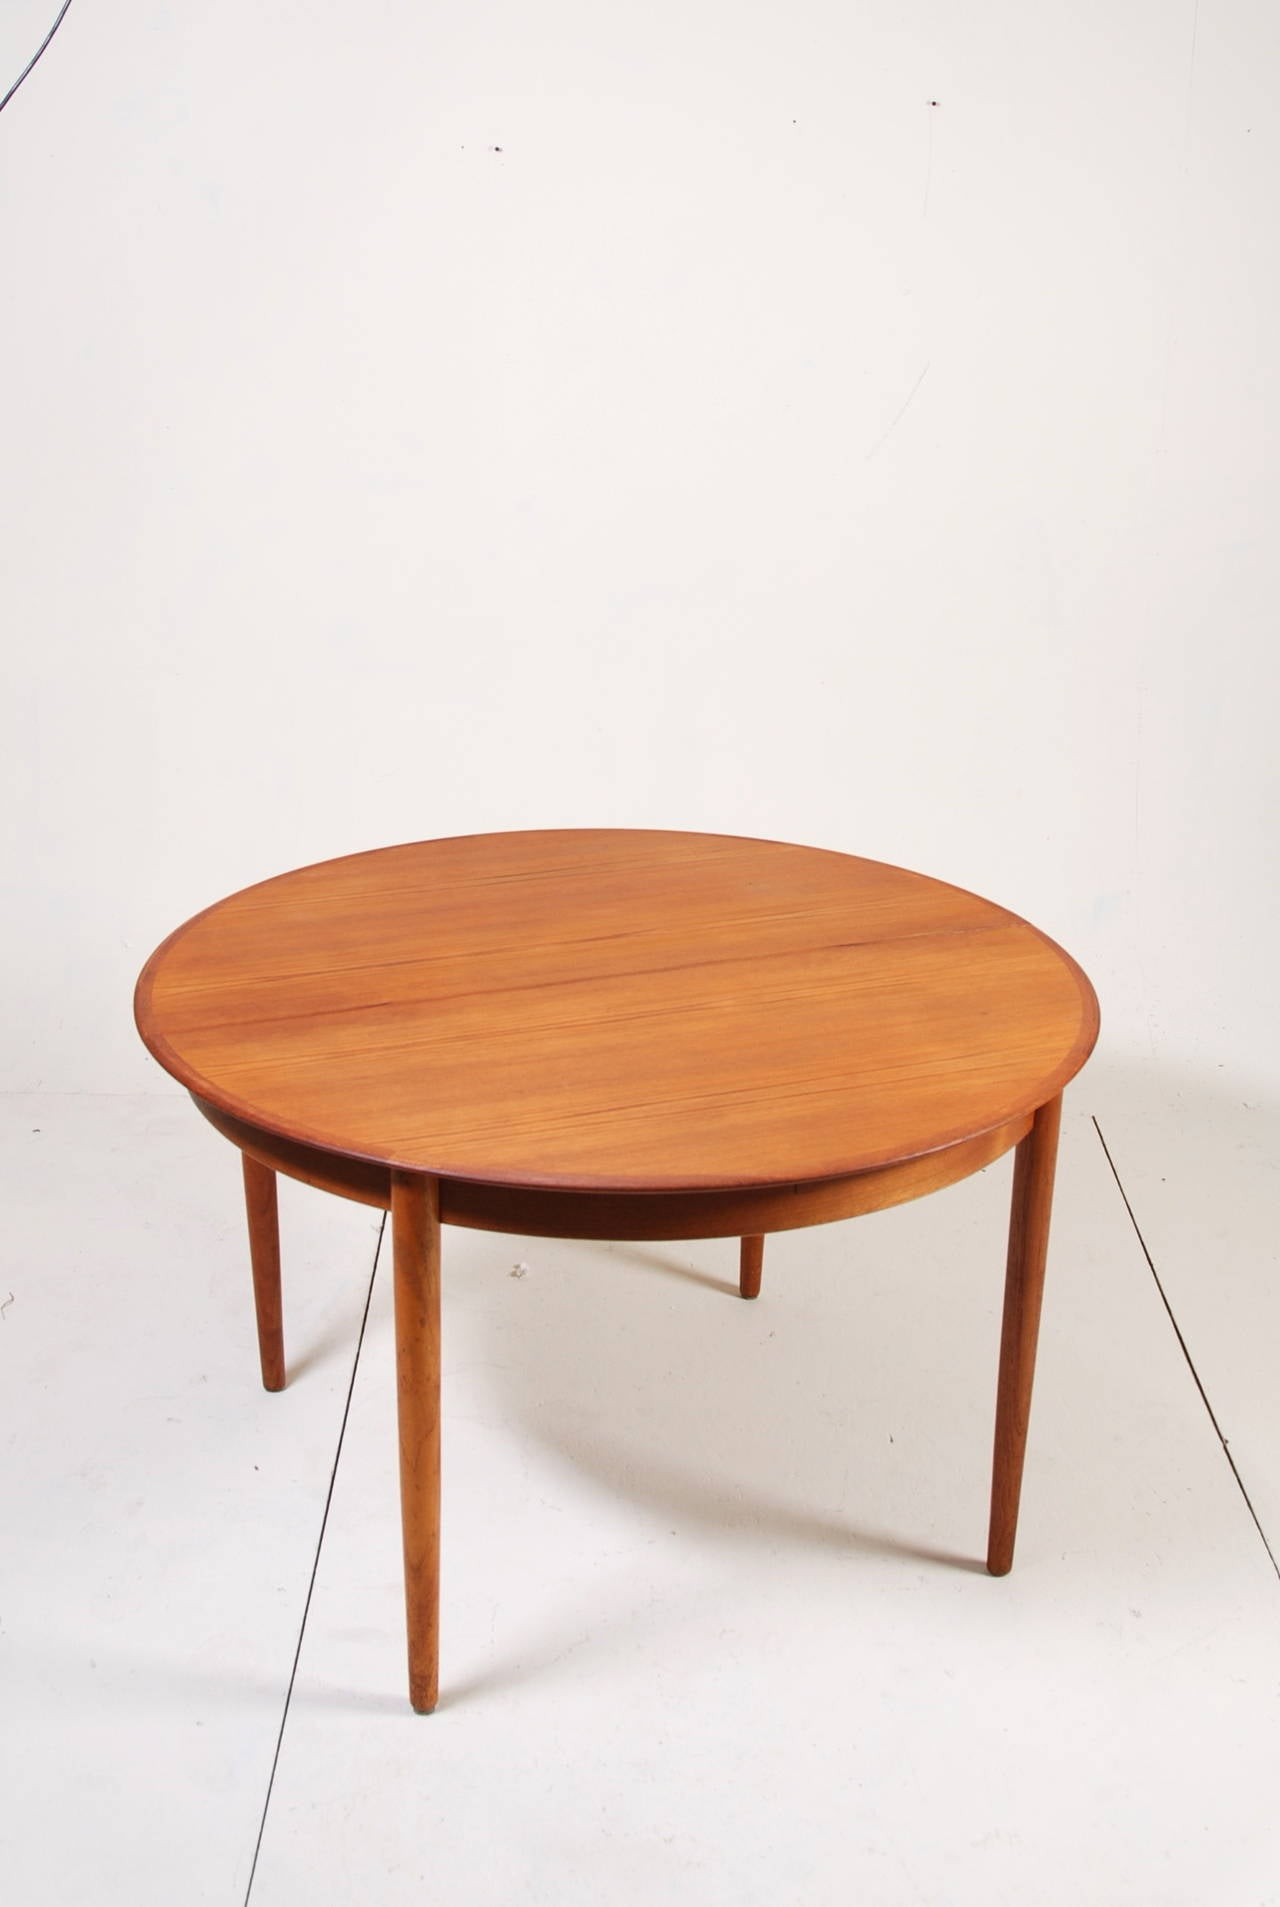 Danish Modern Dining Table Round Danish Modern Teak Dining Table By Dyrlund At 1stdibs